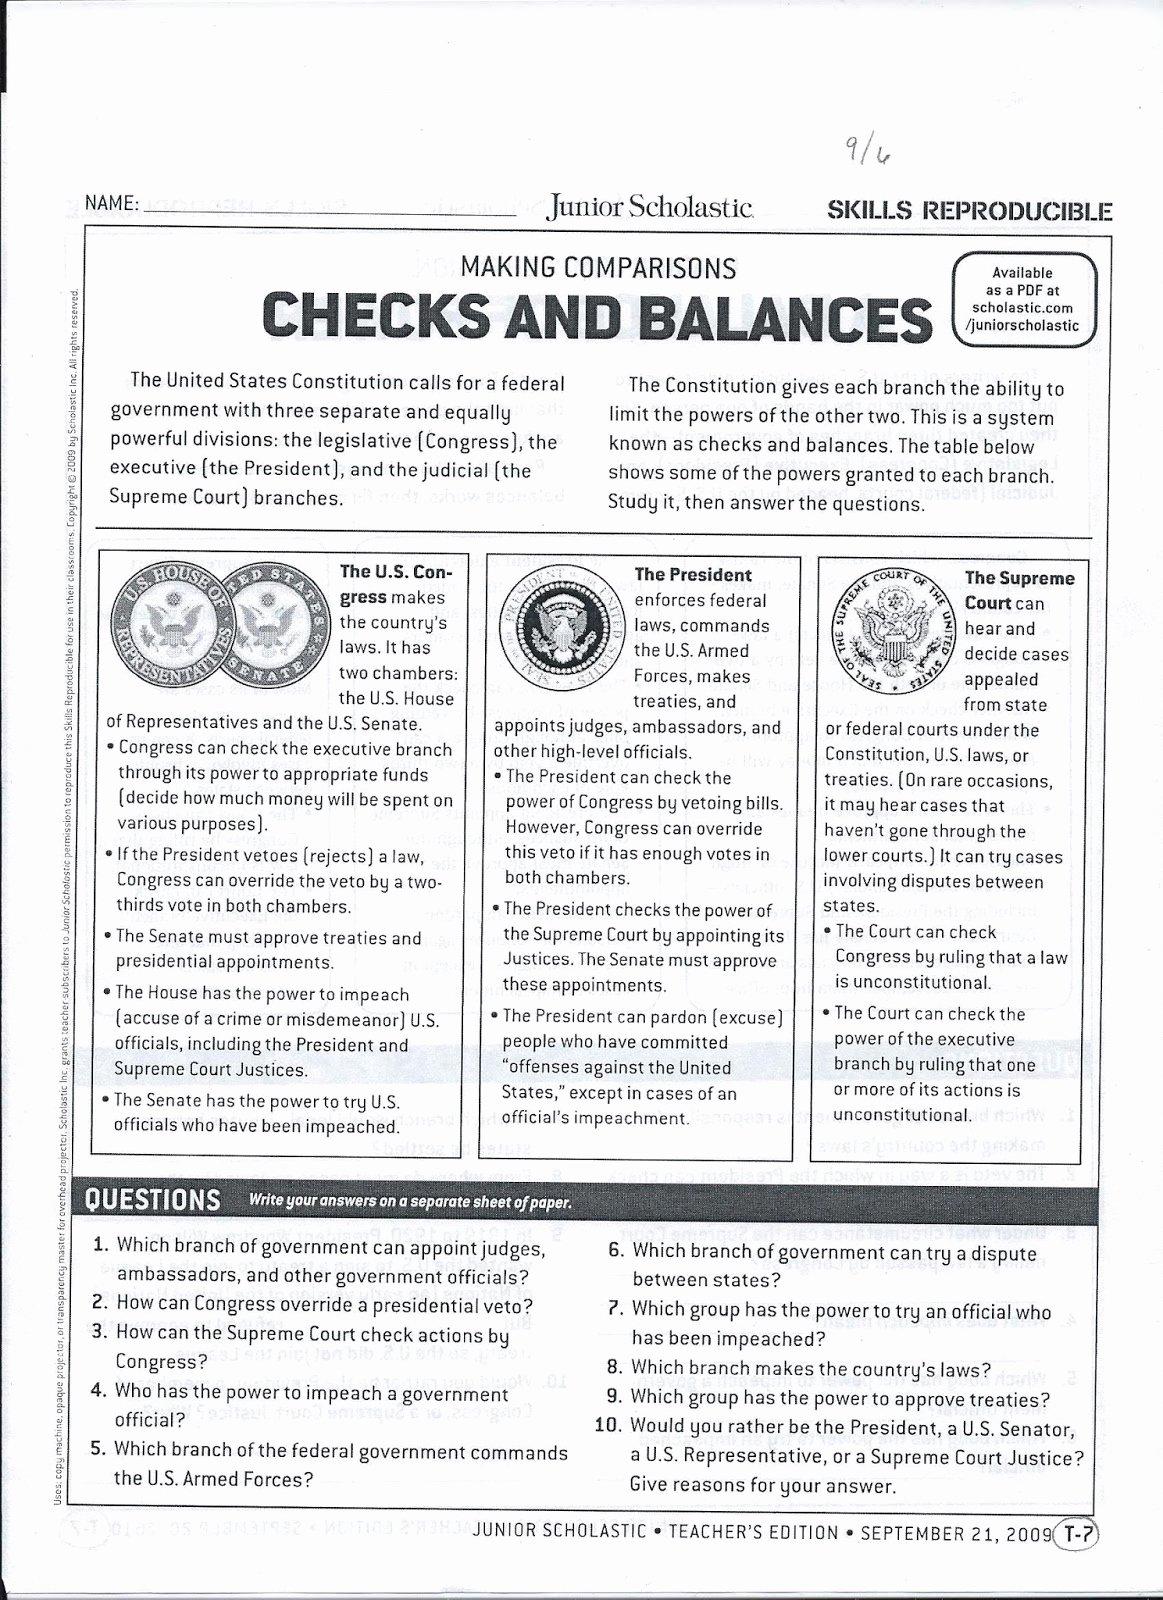 Checks and Balances Worksheet Answers Kids Gms 6th Grade social Stu S Checks and Balances